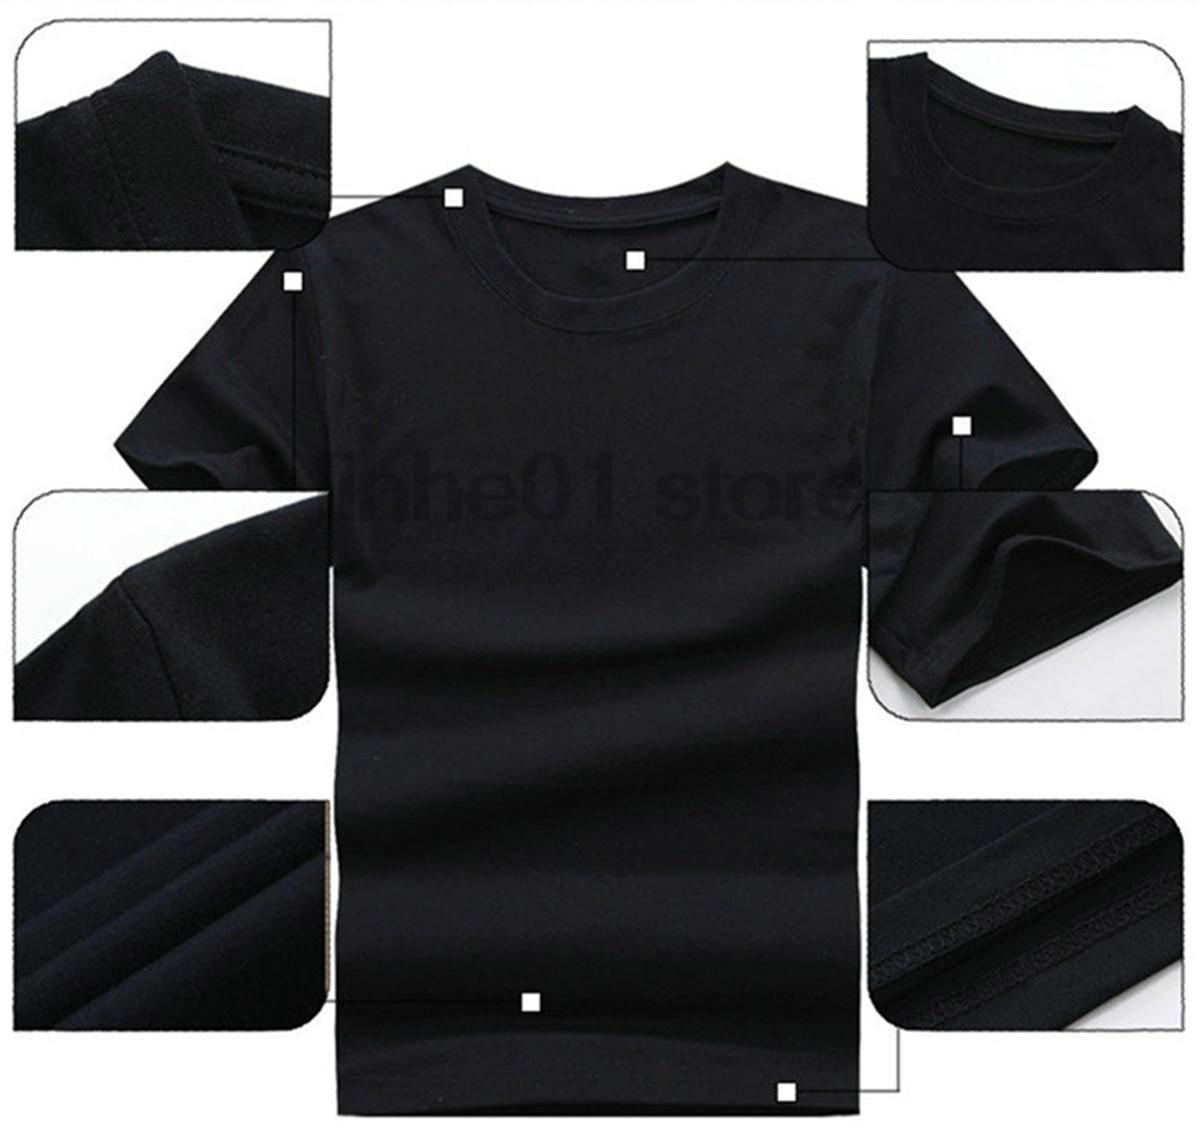 GILDAN Crossed skateboard decks T-Shirt sunglasses women T-shirt